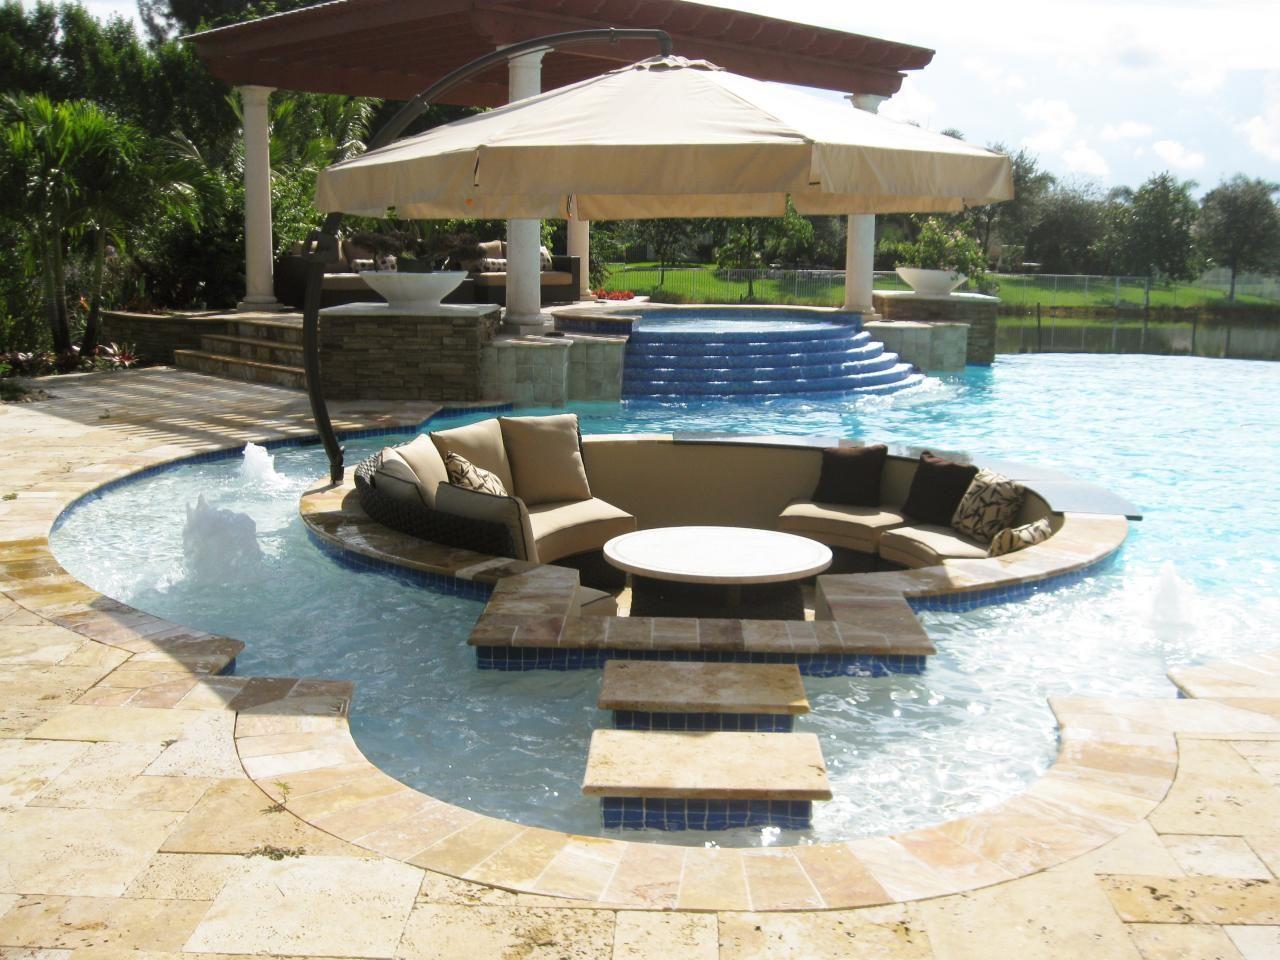 Dreamy Pool Design Ideas | Outdoor Design - Landscaping Ideas, Porches, Decks, & Patios | HGTV